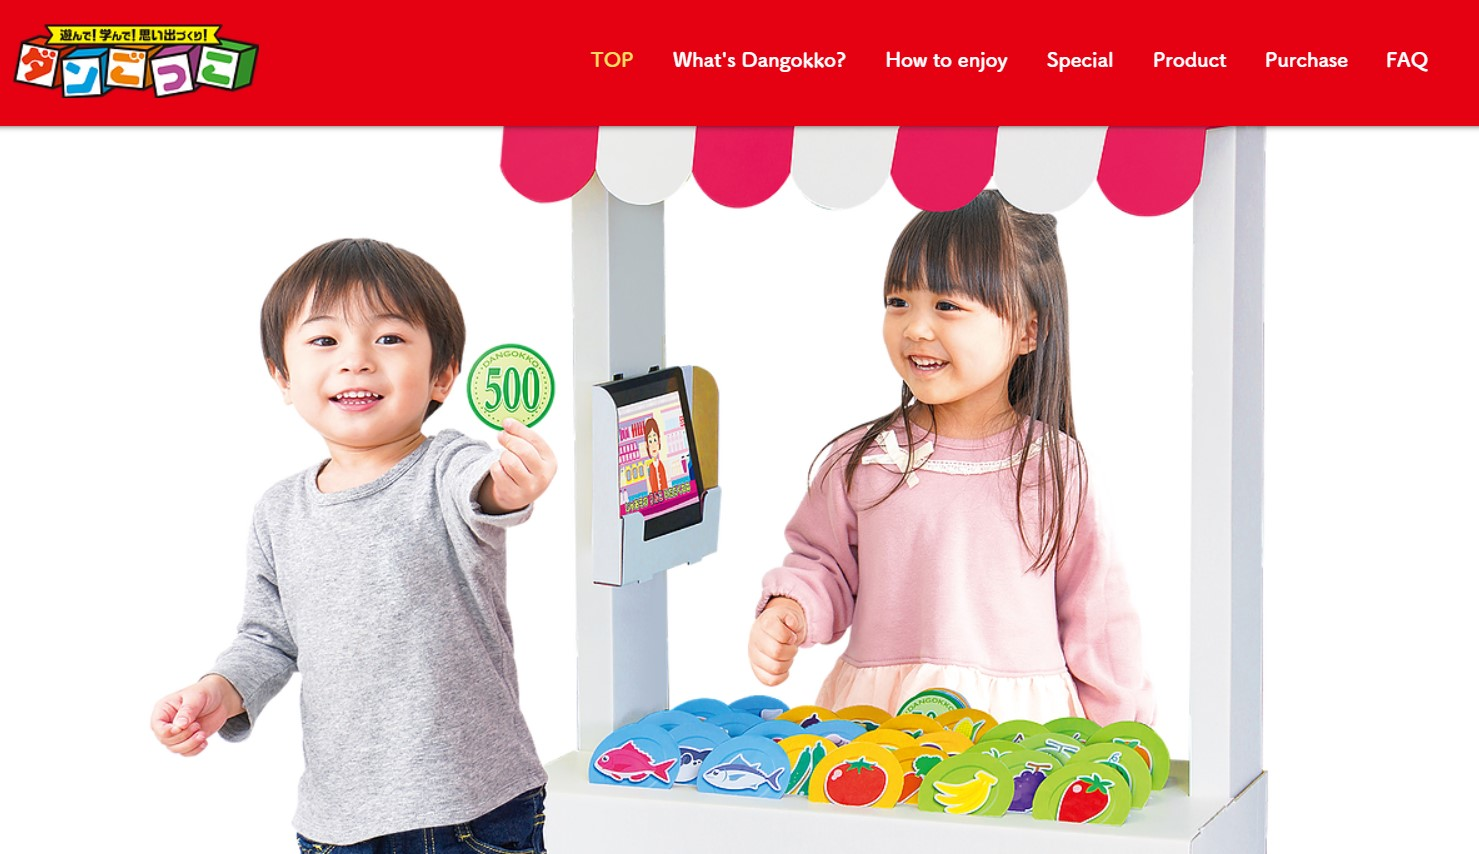 ARで3D画像や映像が出現! リモートでも遊べる知育玩具「ダンごっこ」が発売